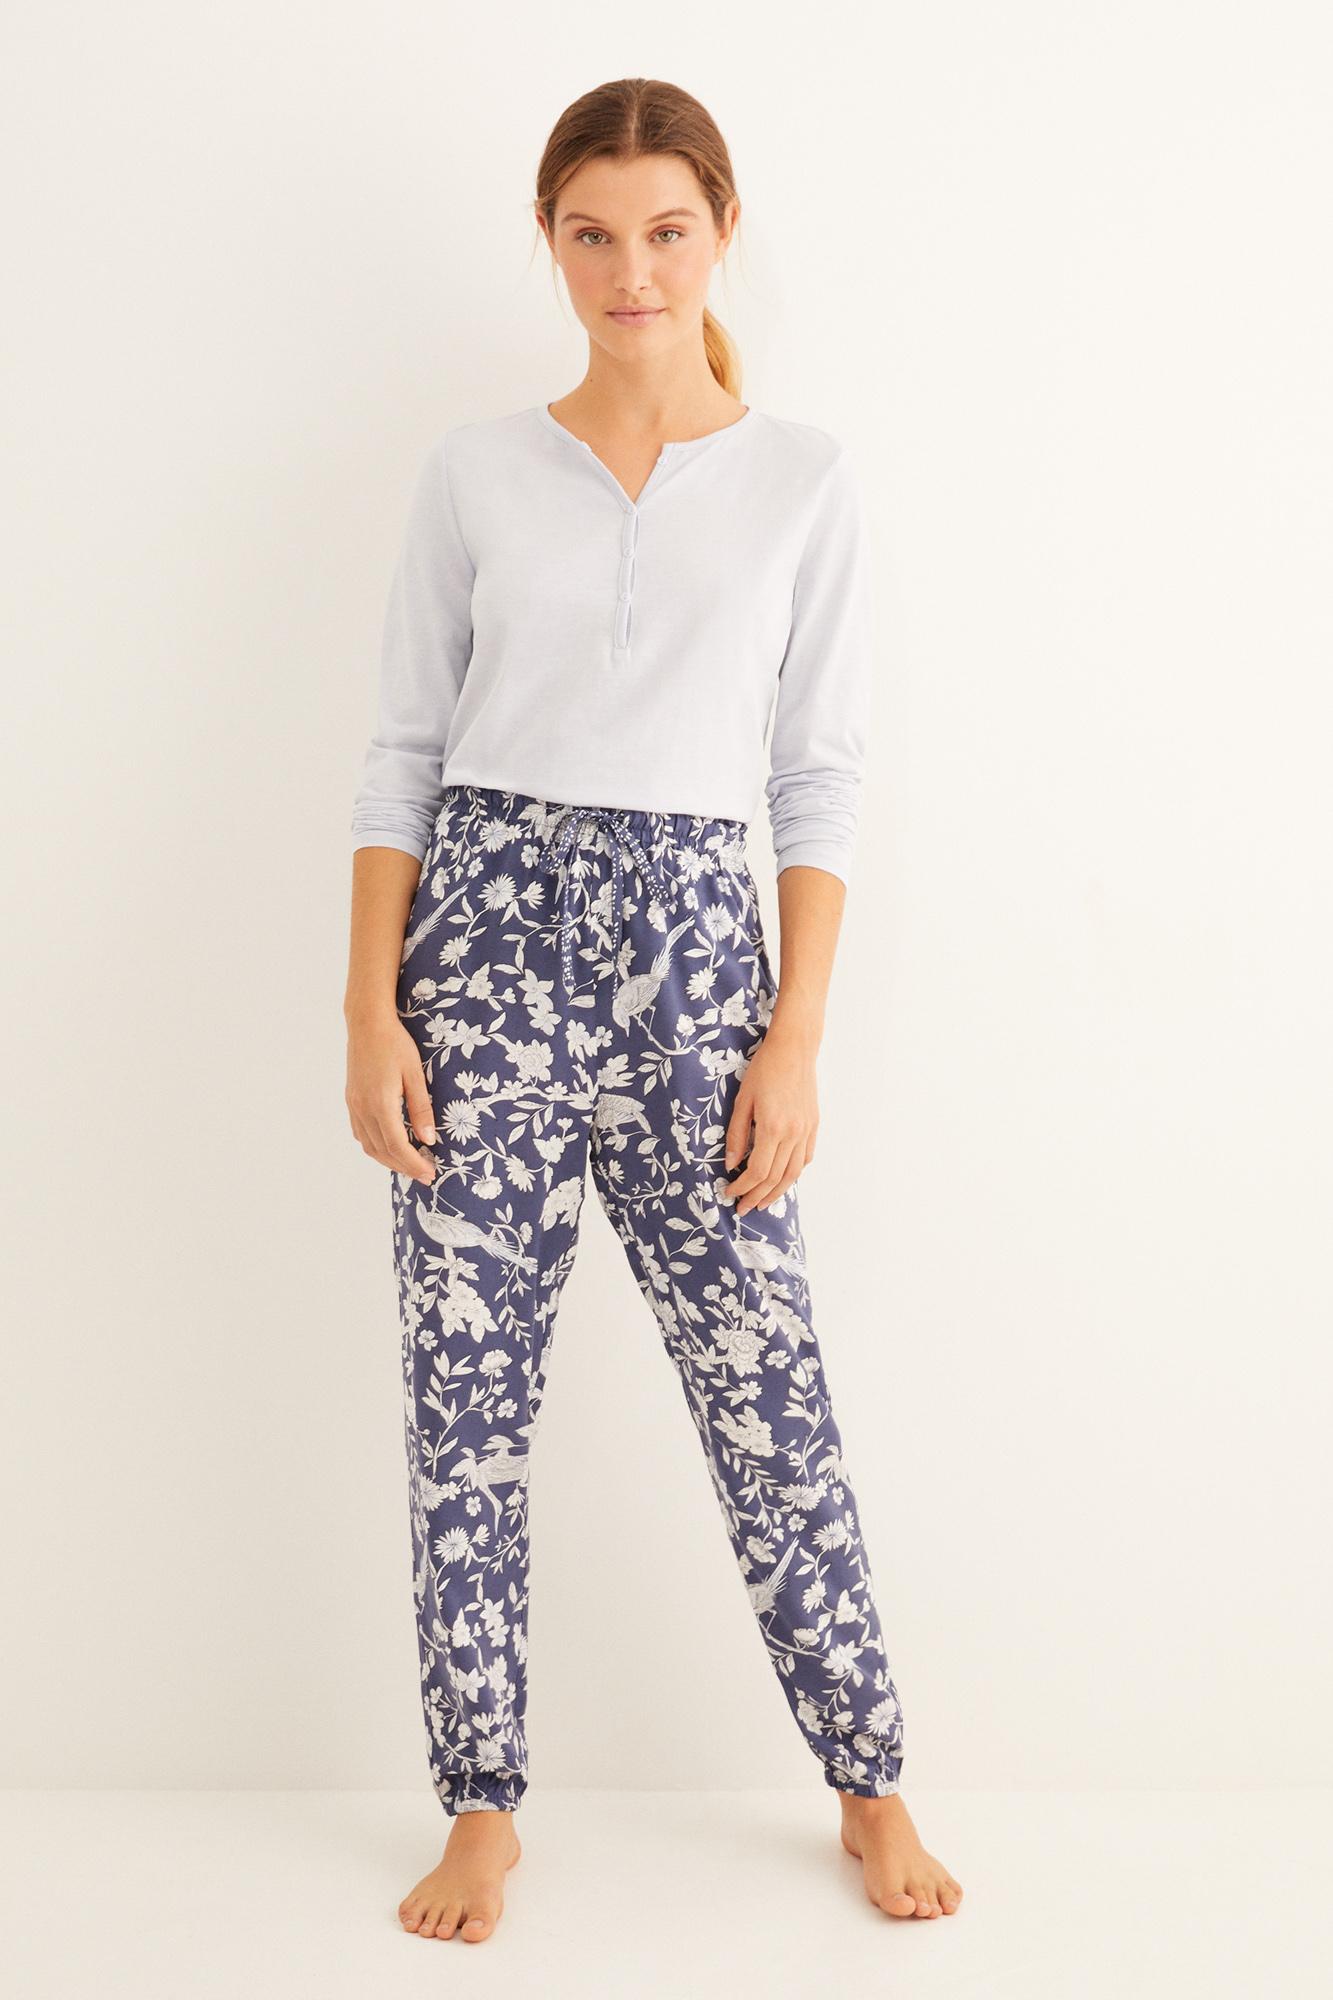 Pantalón largo de pijama estampado azul navy